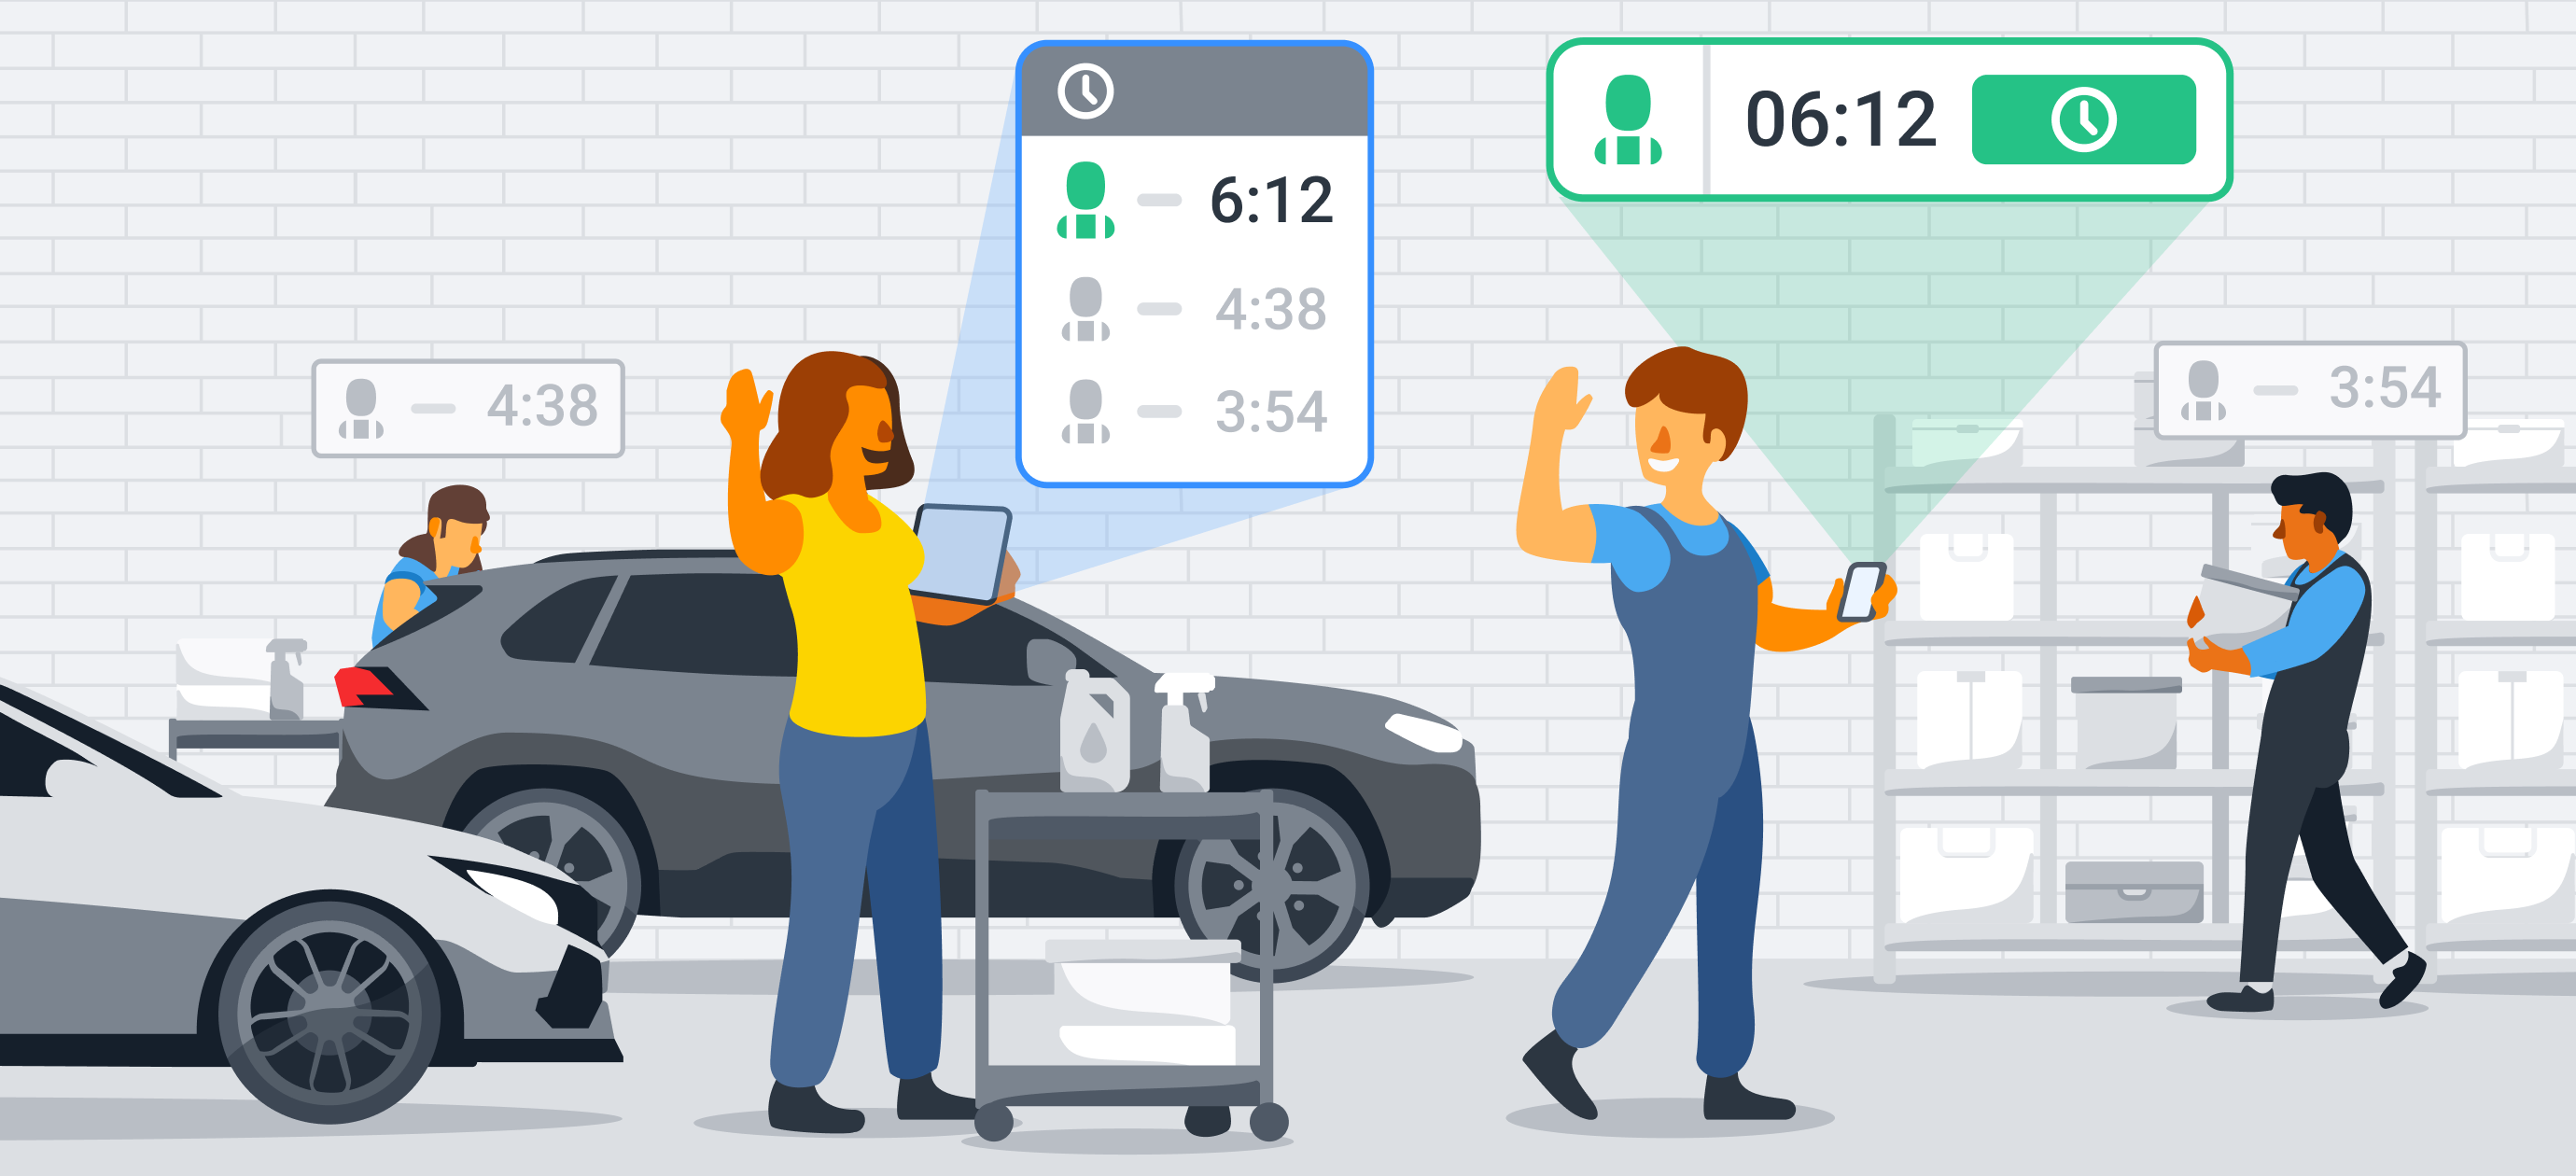 Maximize Your Shop's Efficiency With Shopmonkey Time Clocks